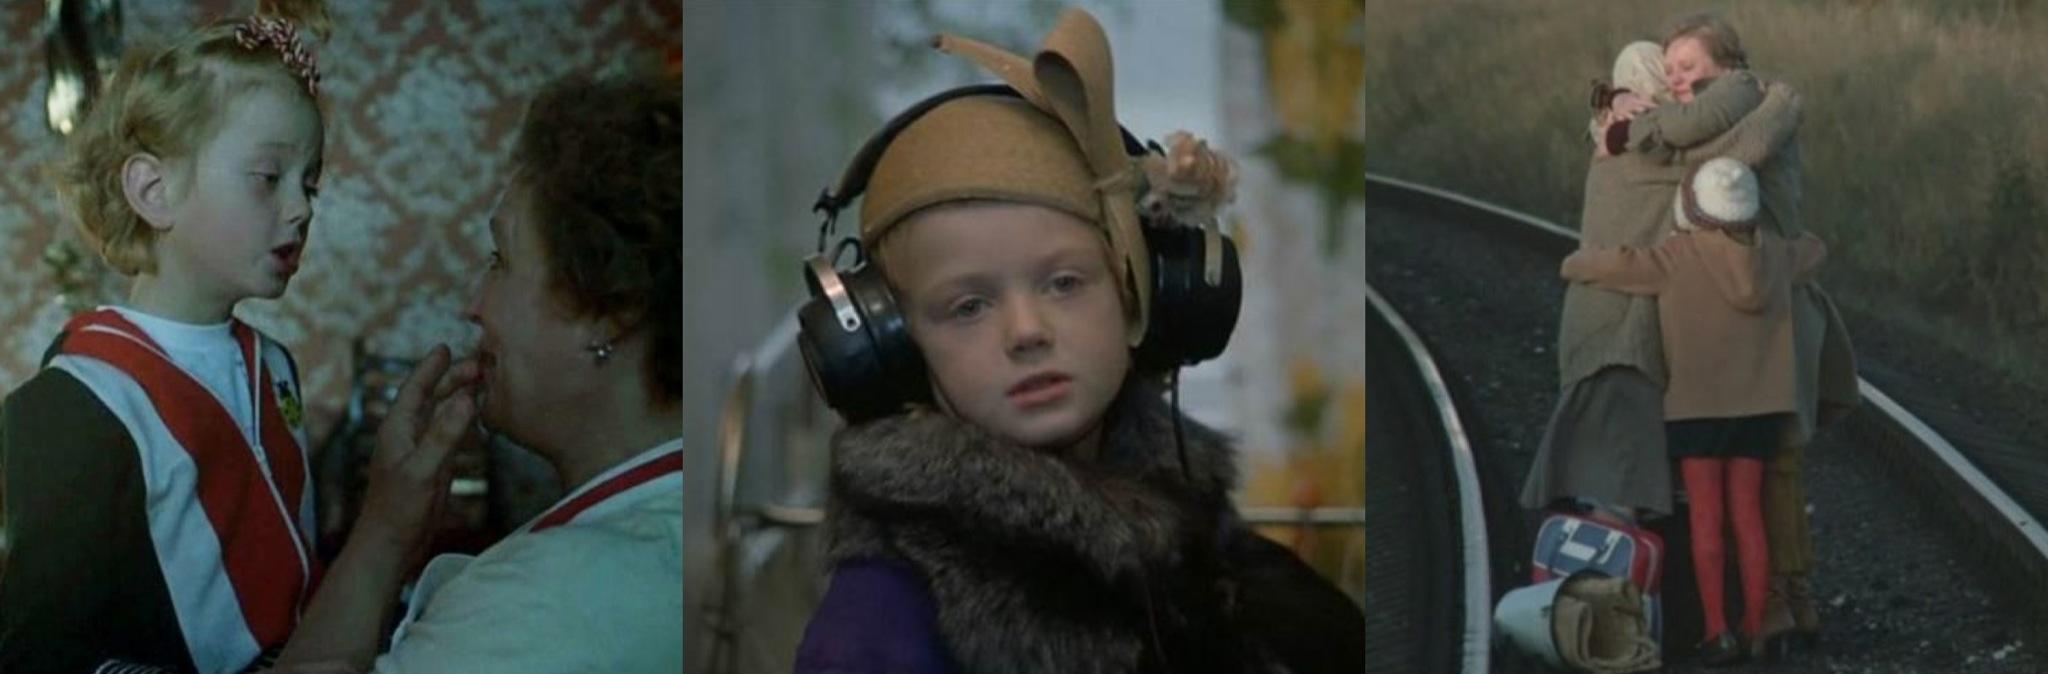 KinobuffMy Top 5 Performances by Children in RussianCinemaPost navigationSponsorRecent PostsCategoriesArchivesFollow Blog via EmailMy TwitterMeta